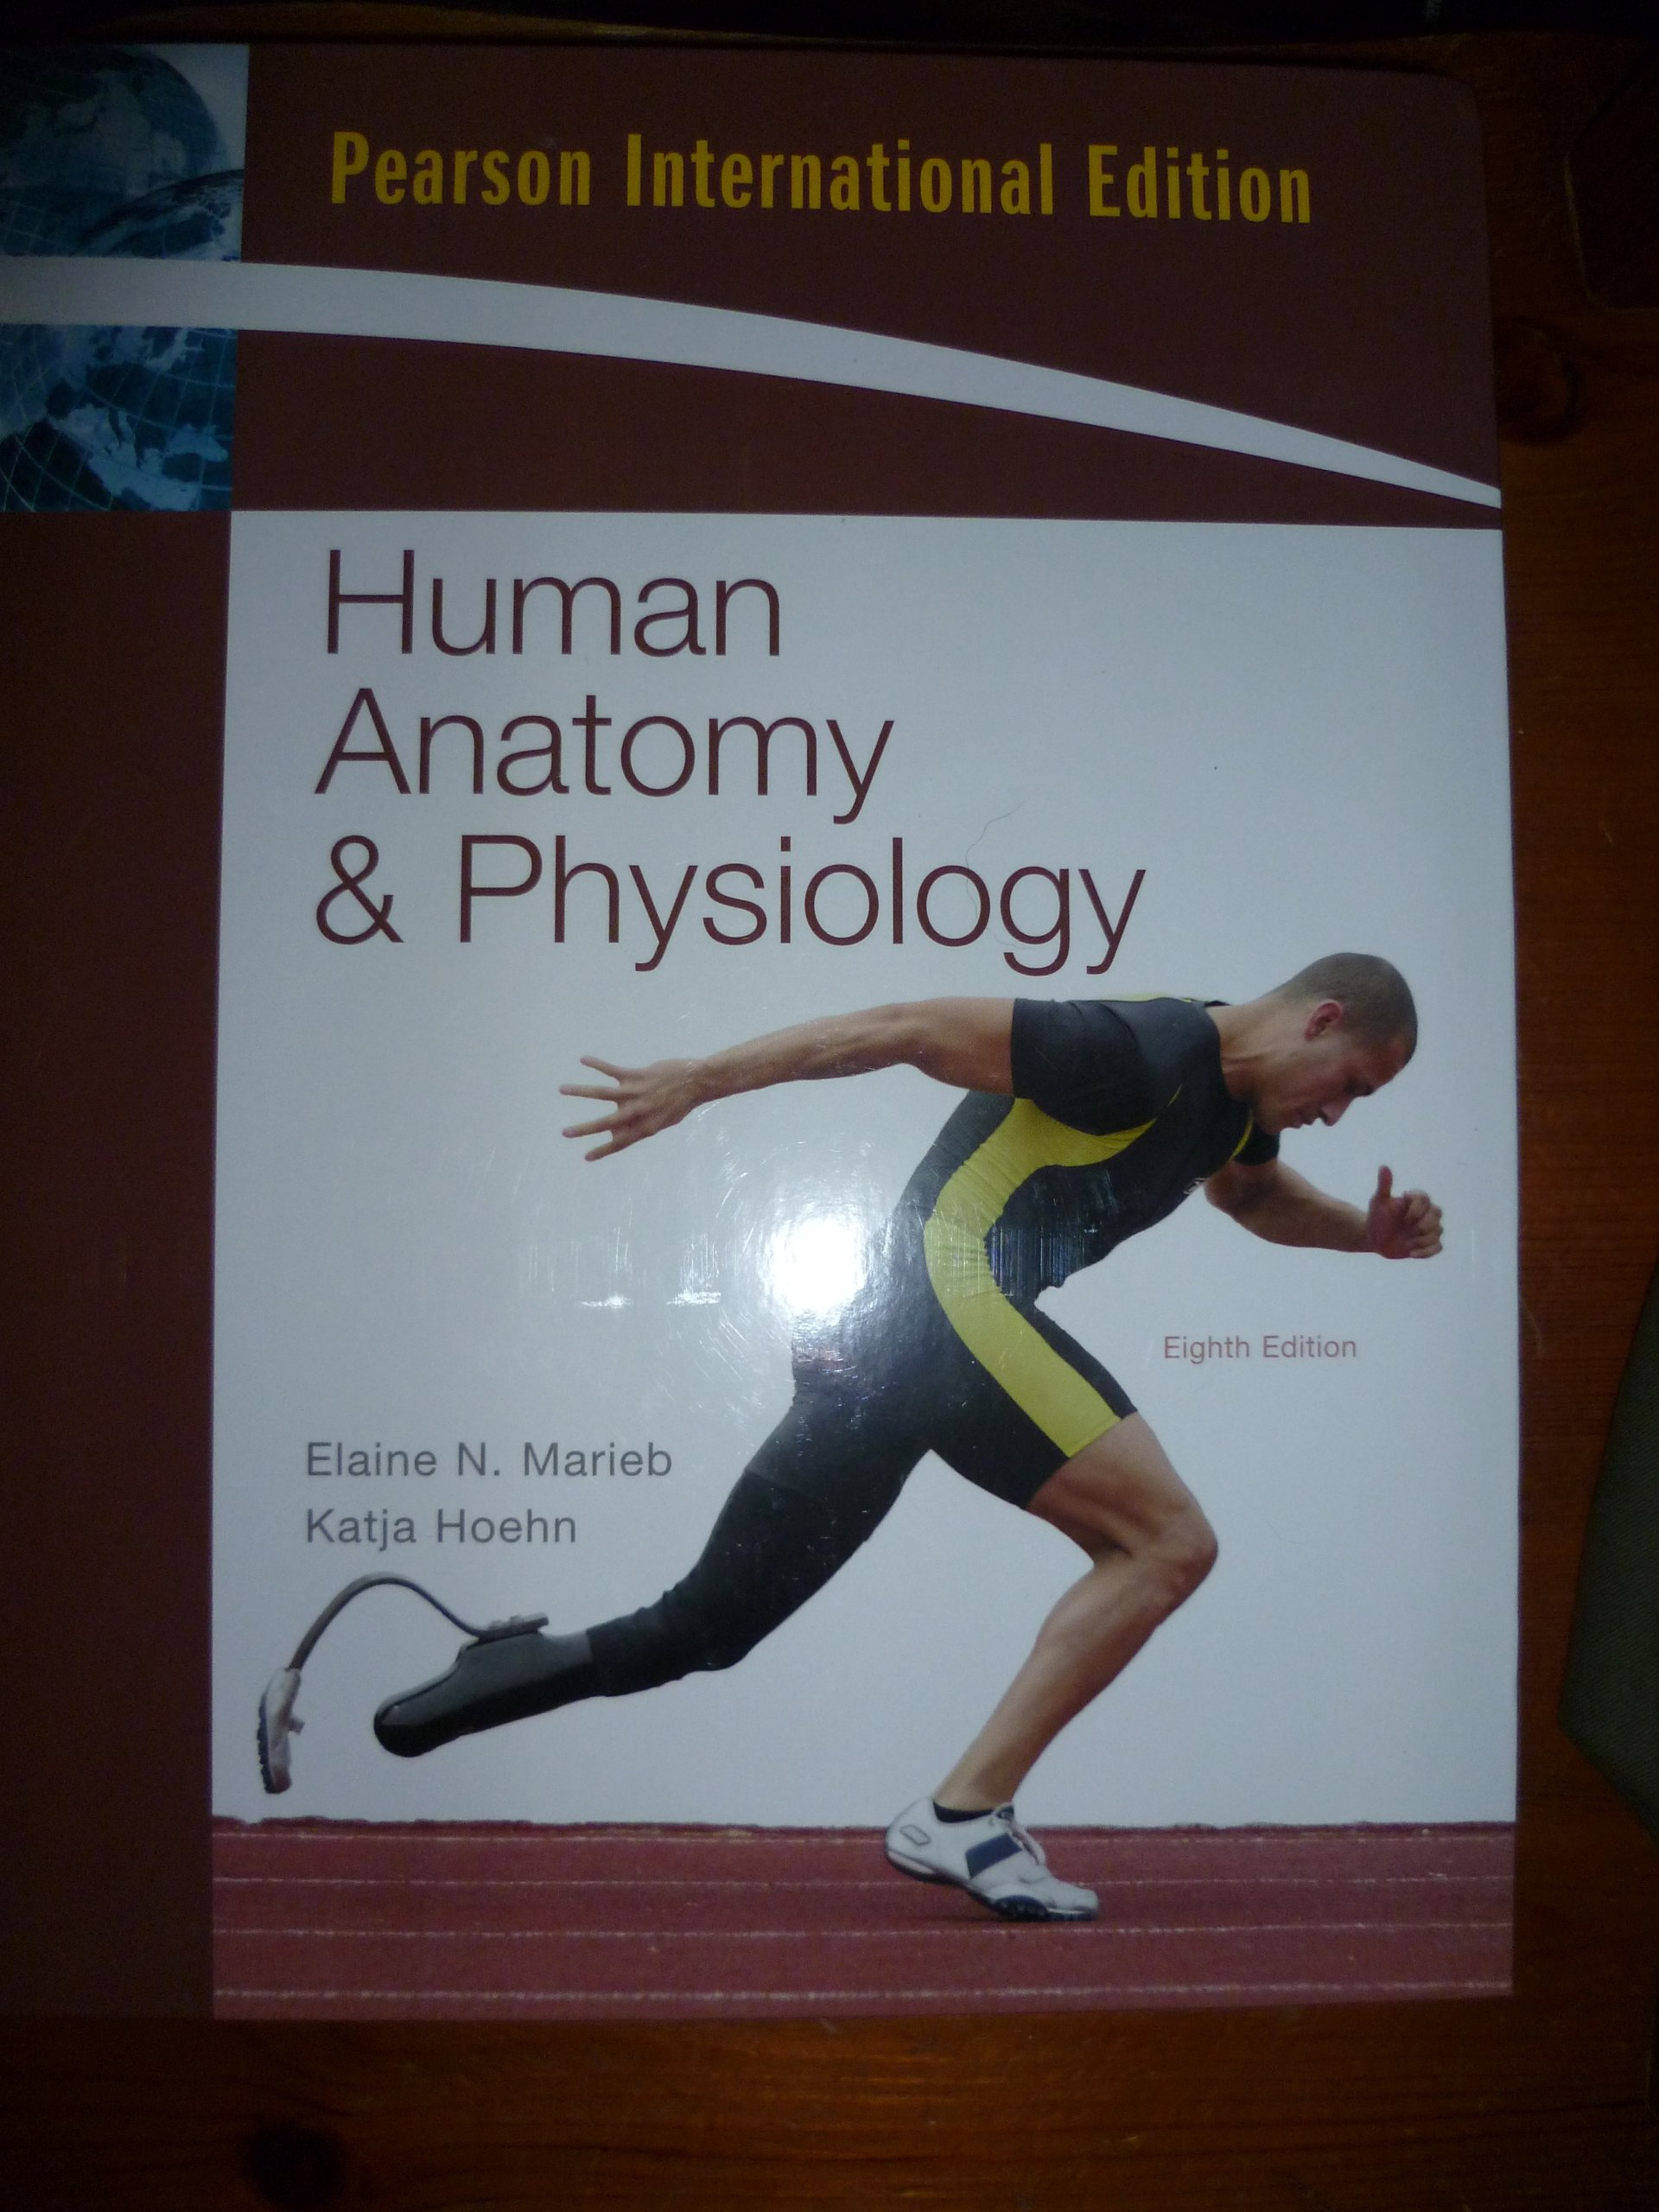 Human Anatomy & Physiology: Amazon.co.uk: Elaine N.; Hoehn, Katja ...